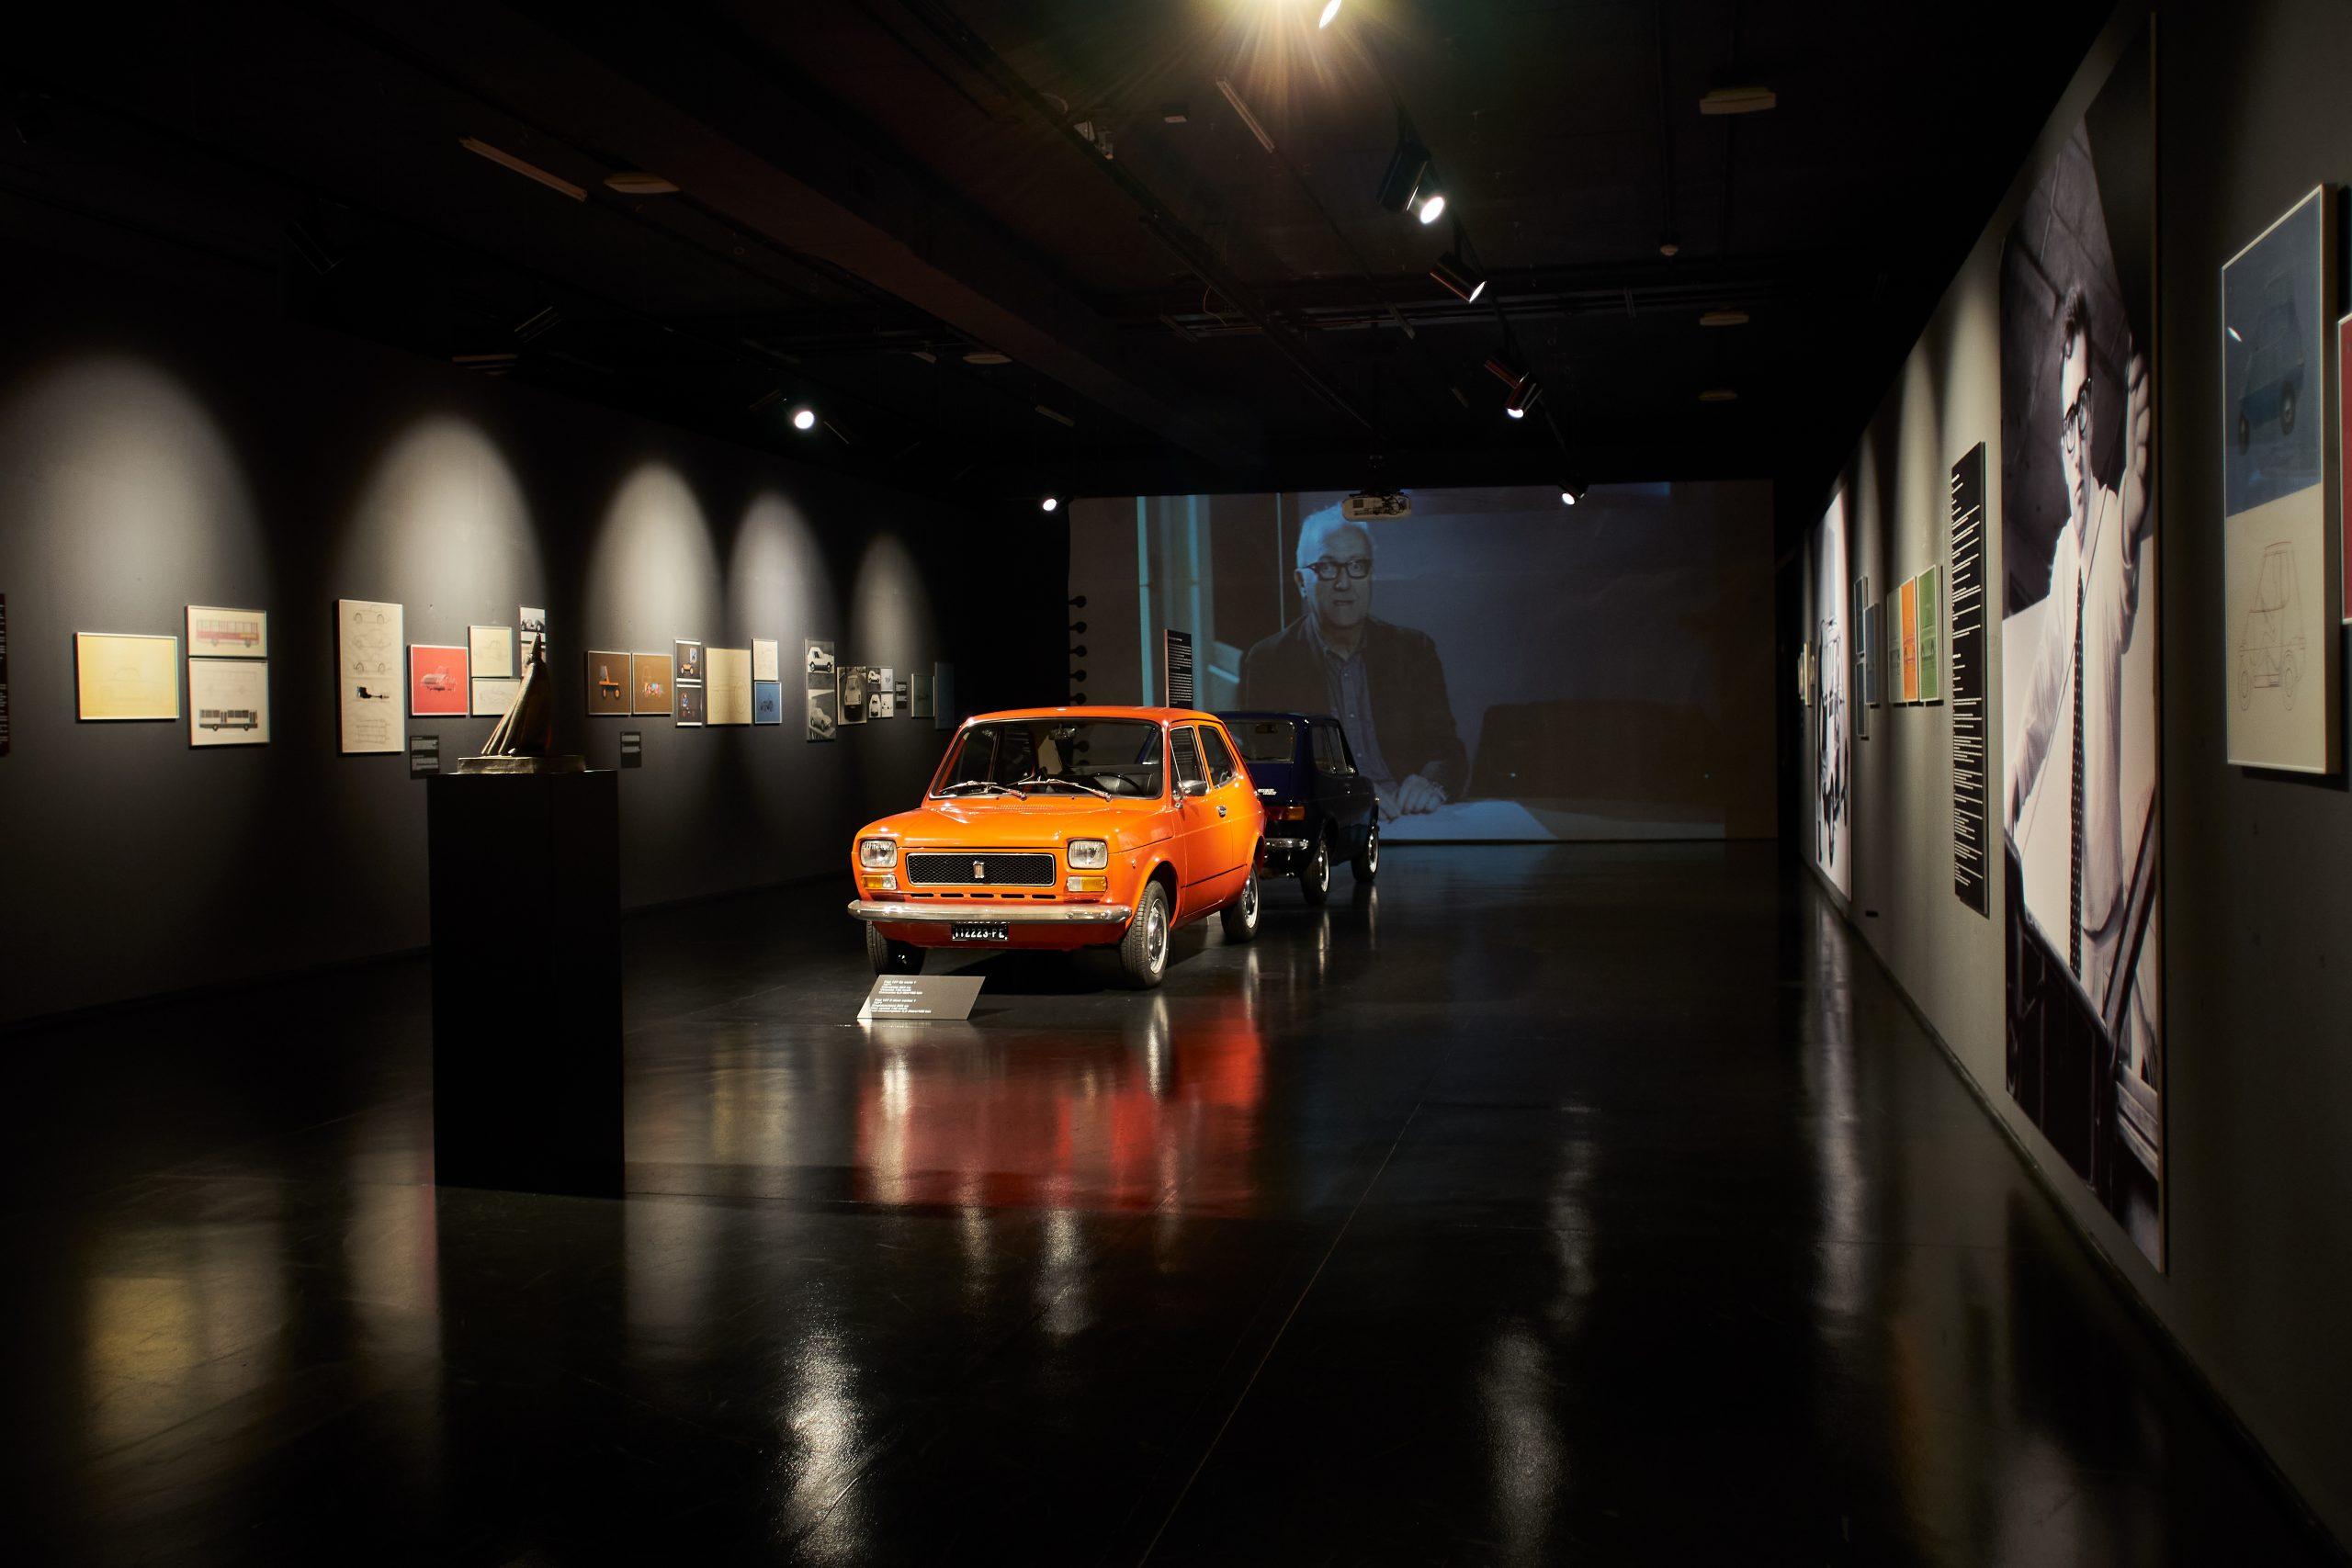 07 Che macchina Exhibition scaled H Fiat, o ιδιοφυής σχεδιαστής και ένα περίεργο ταξί Fiat, retro, ειδήσεις, Νέα